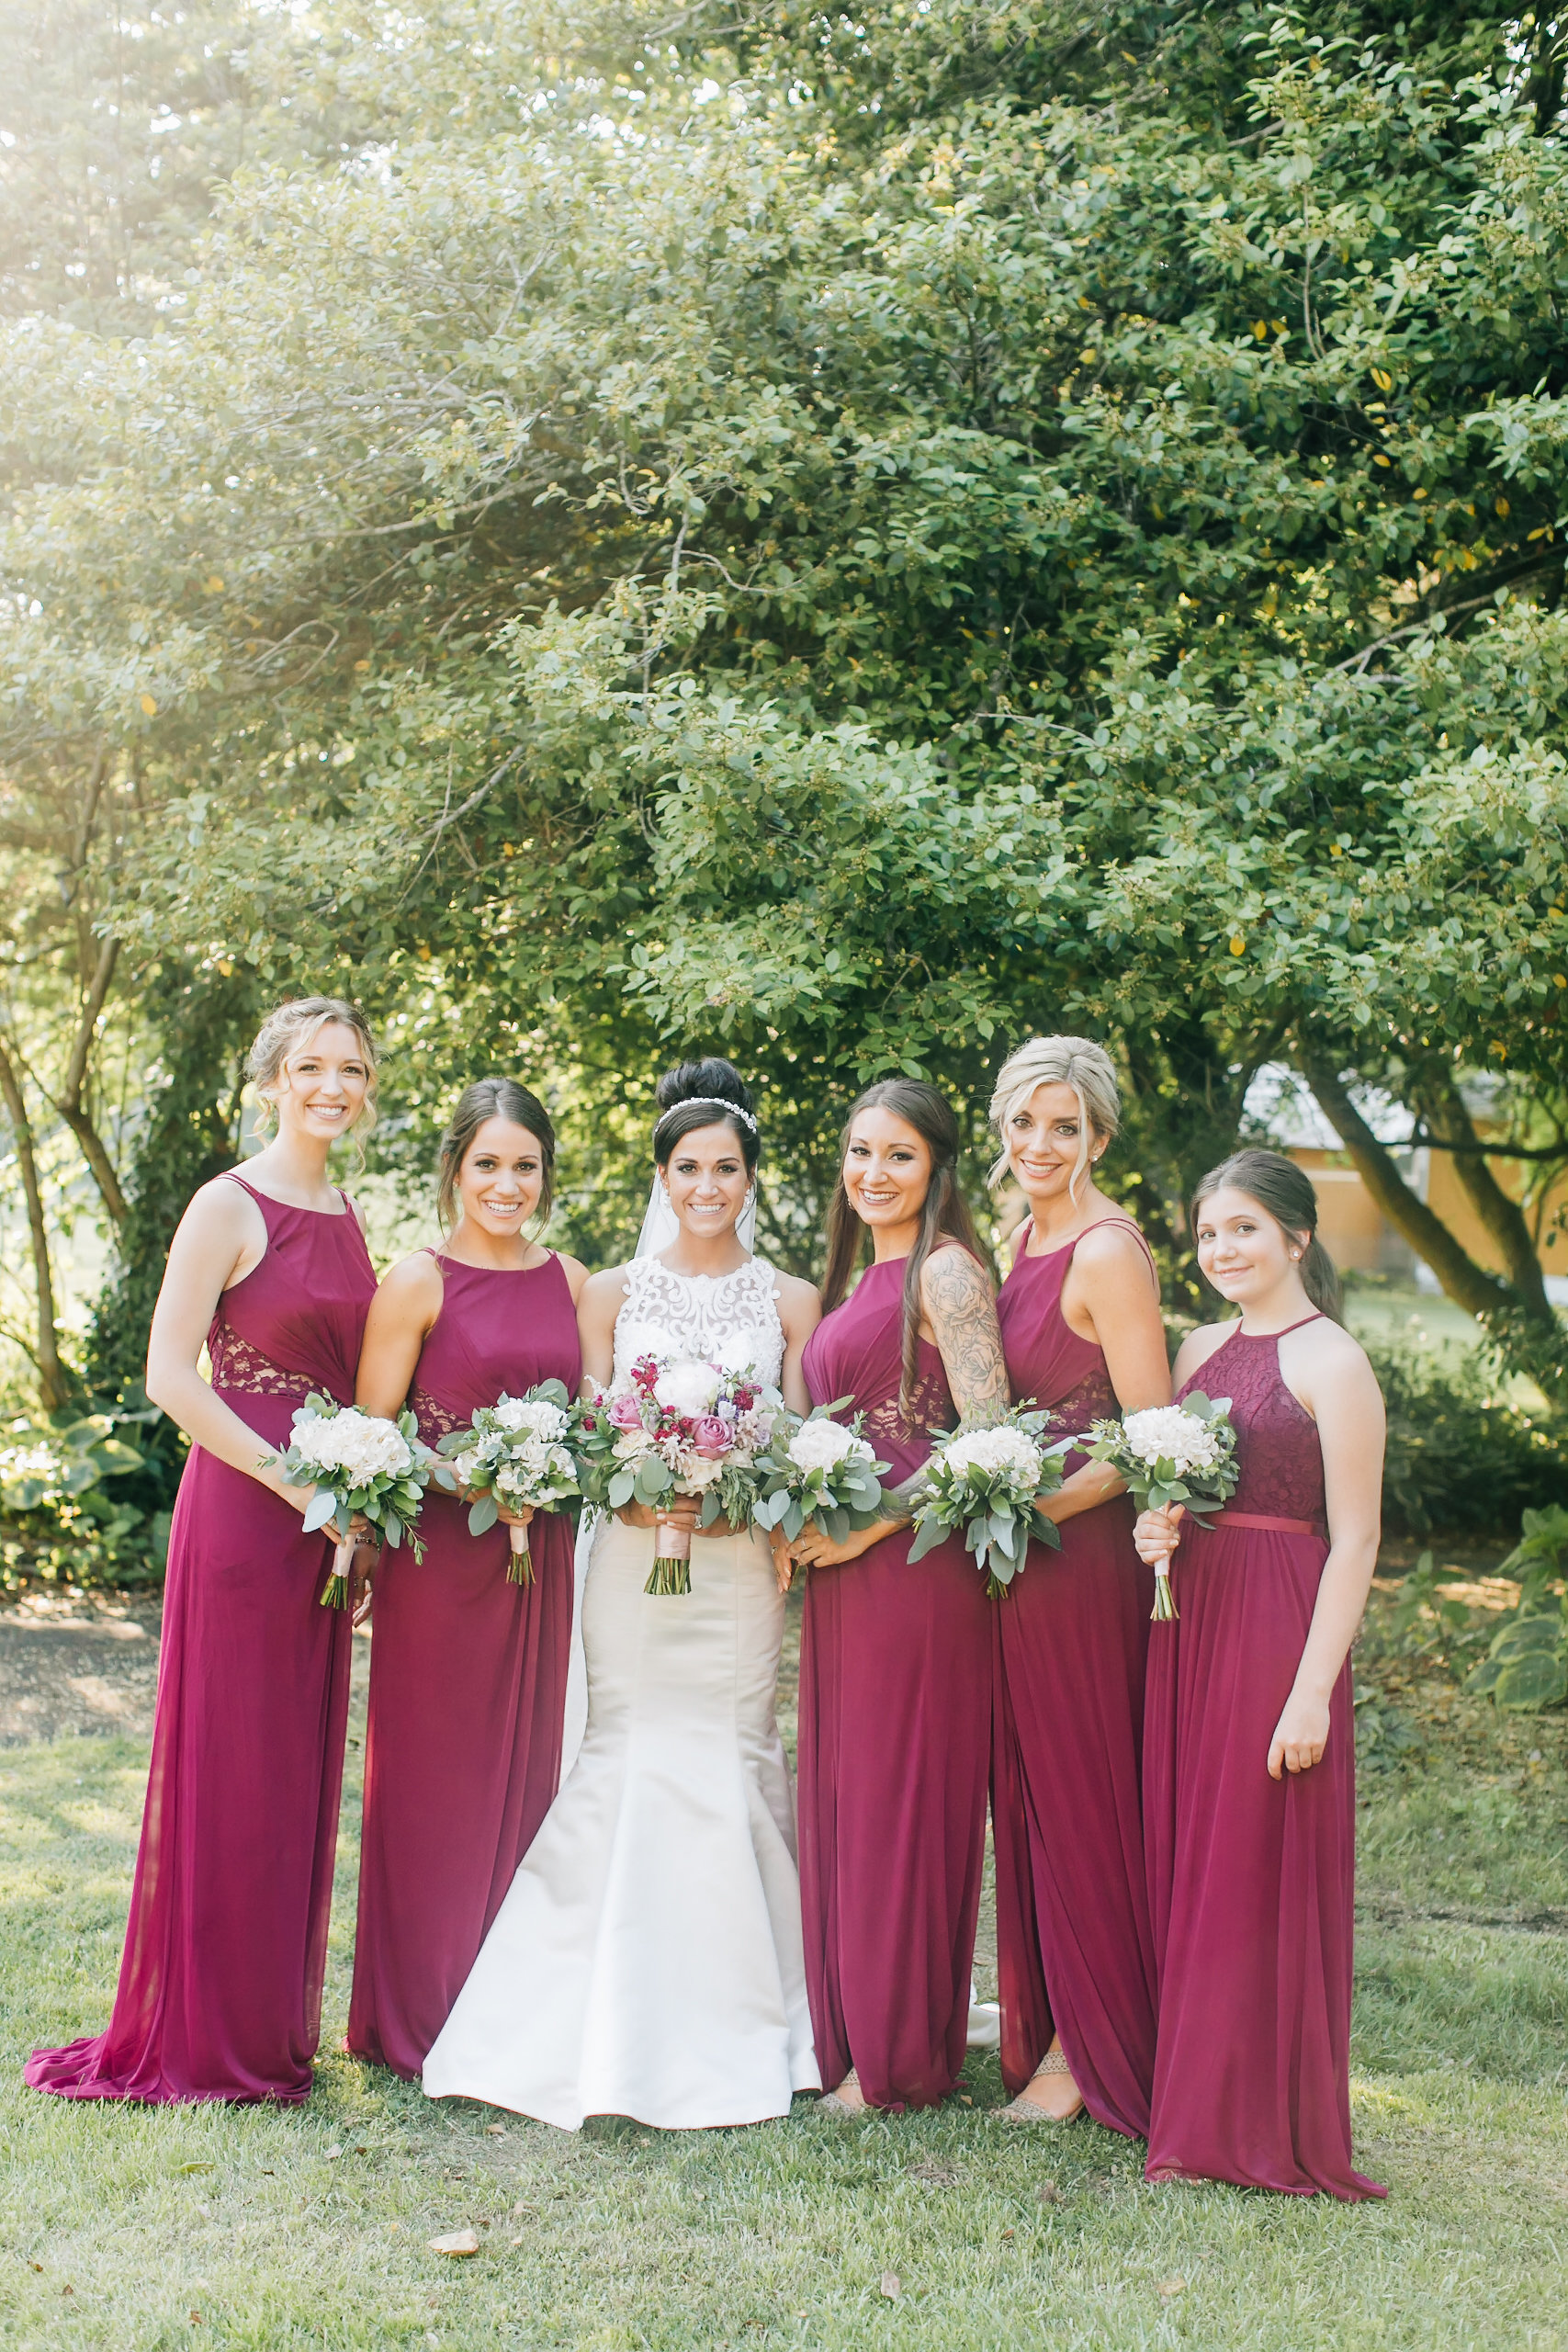 MagdalenaStudios_WeddingPhotographer_WillowCreekWinery_CarissaJoe-373.jpg